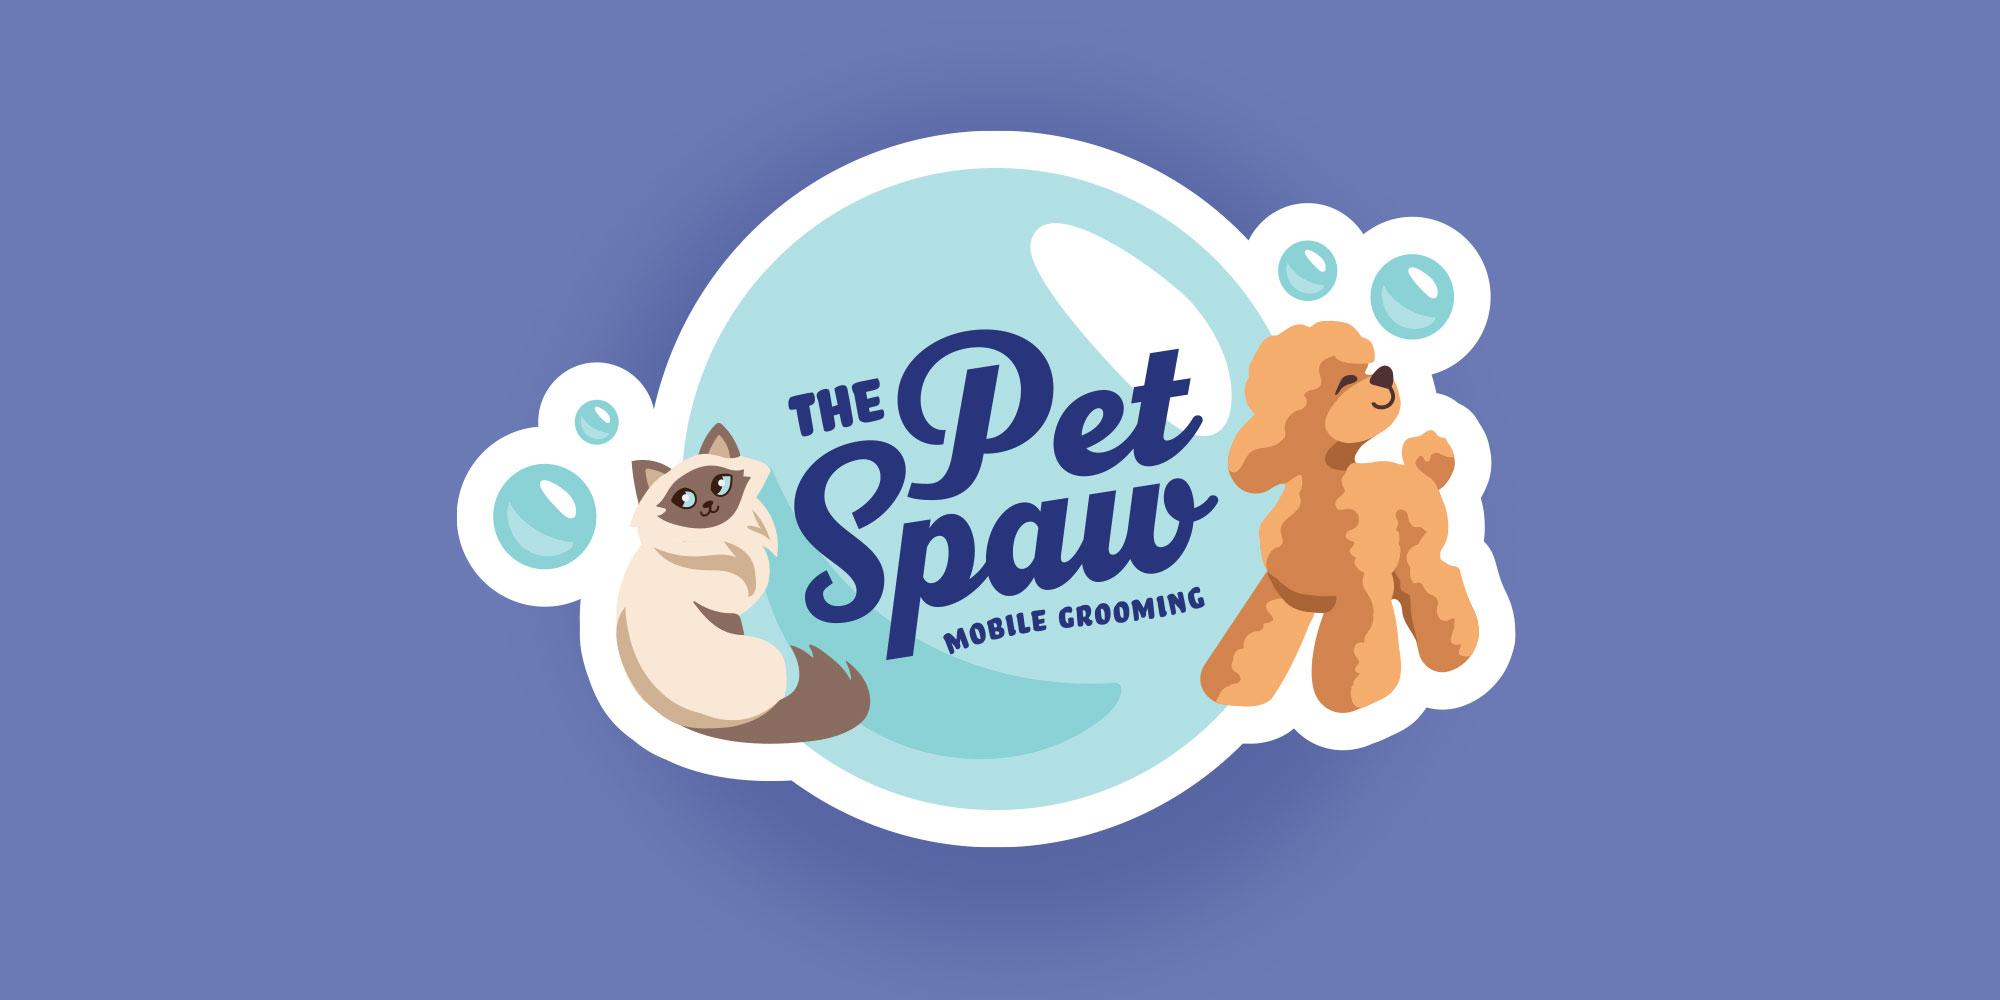 The Pet Spaw